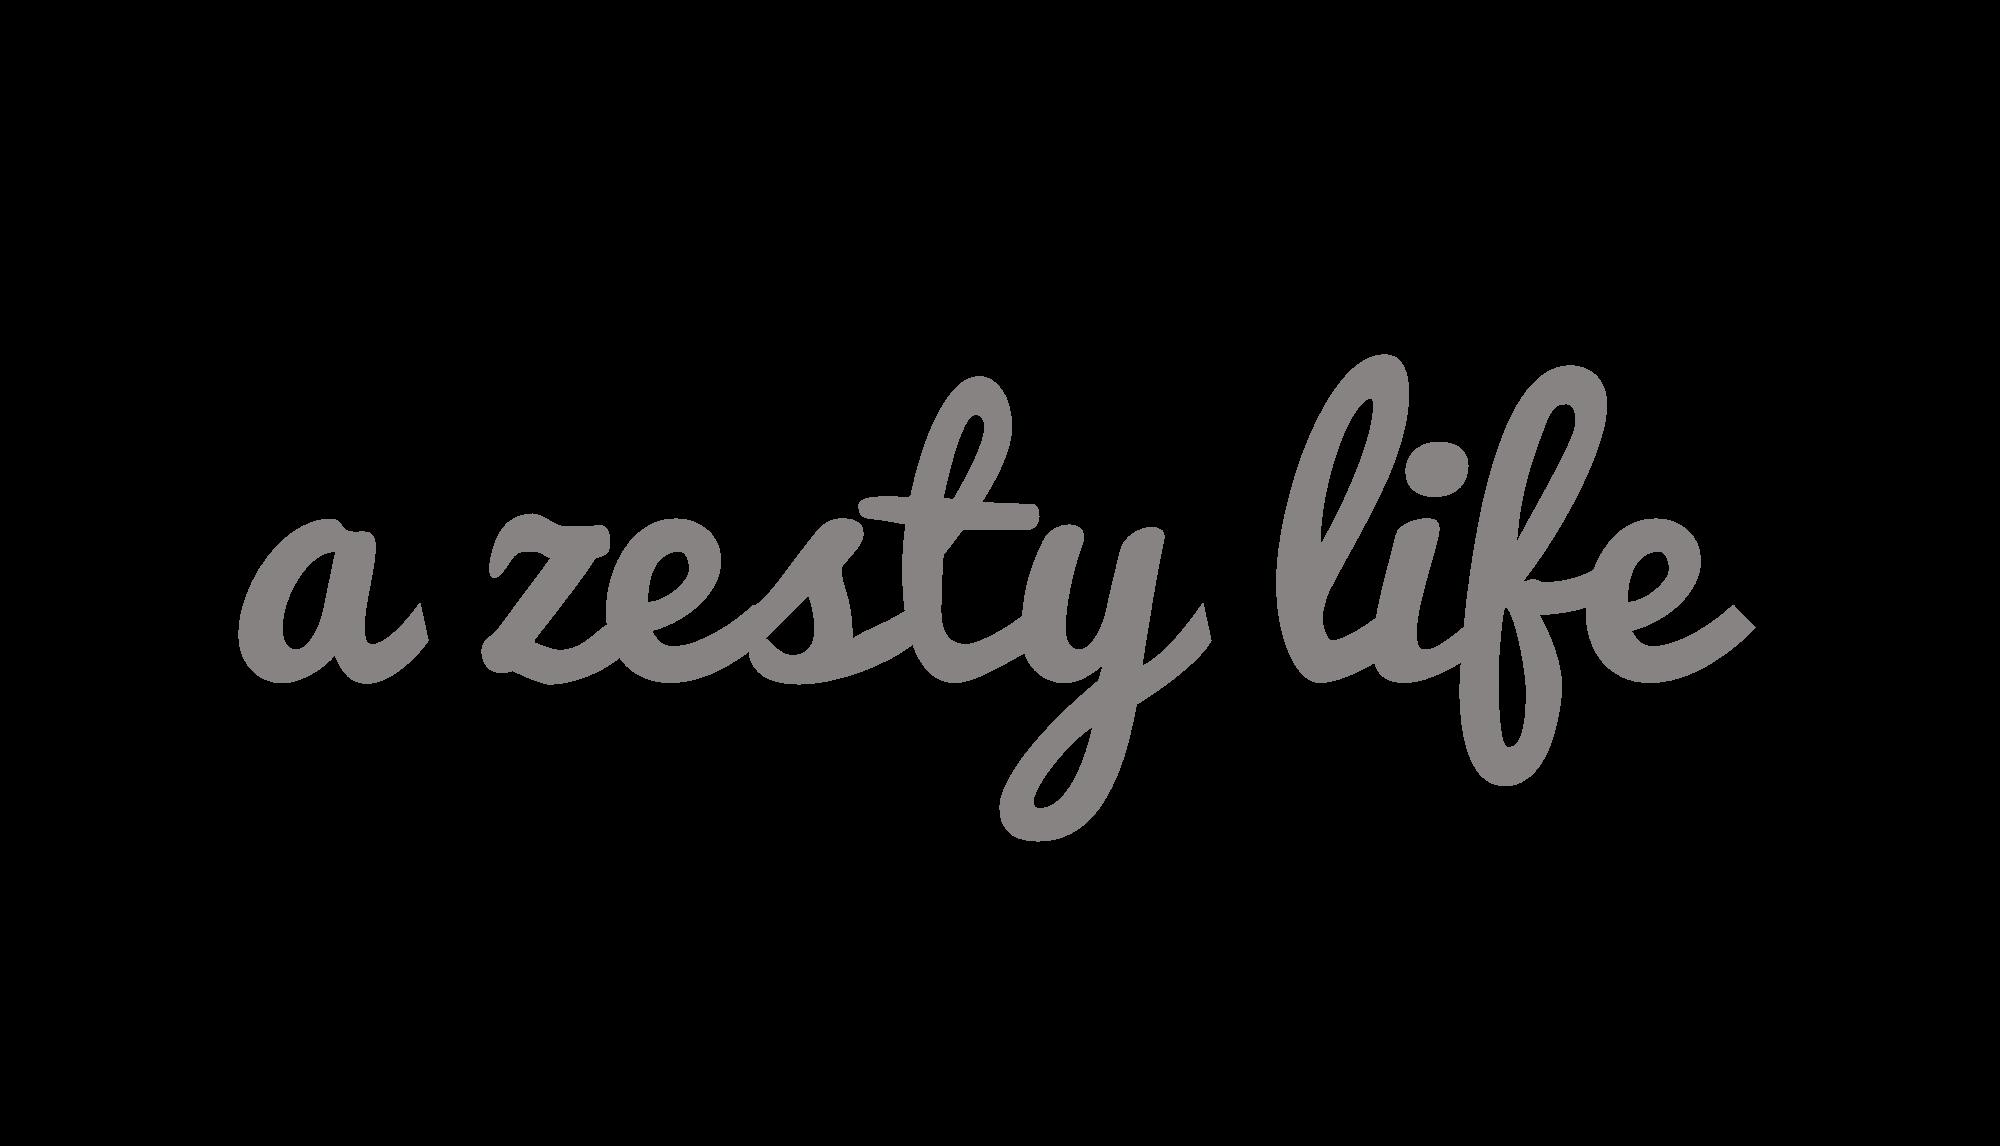 a-zesty-life-logo-1.png